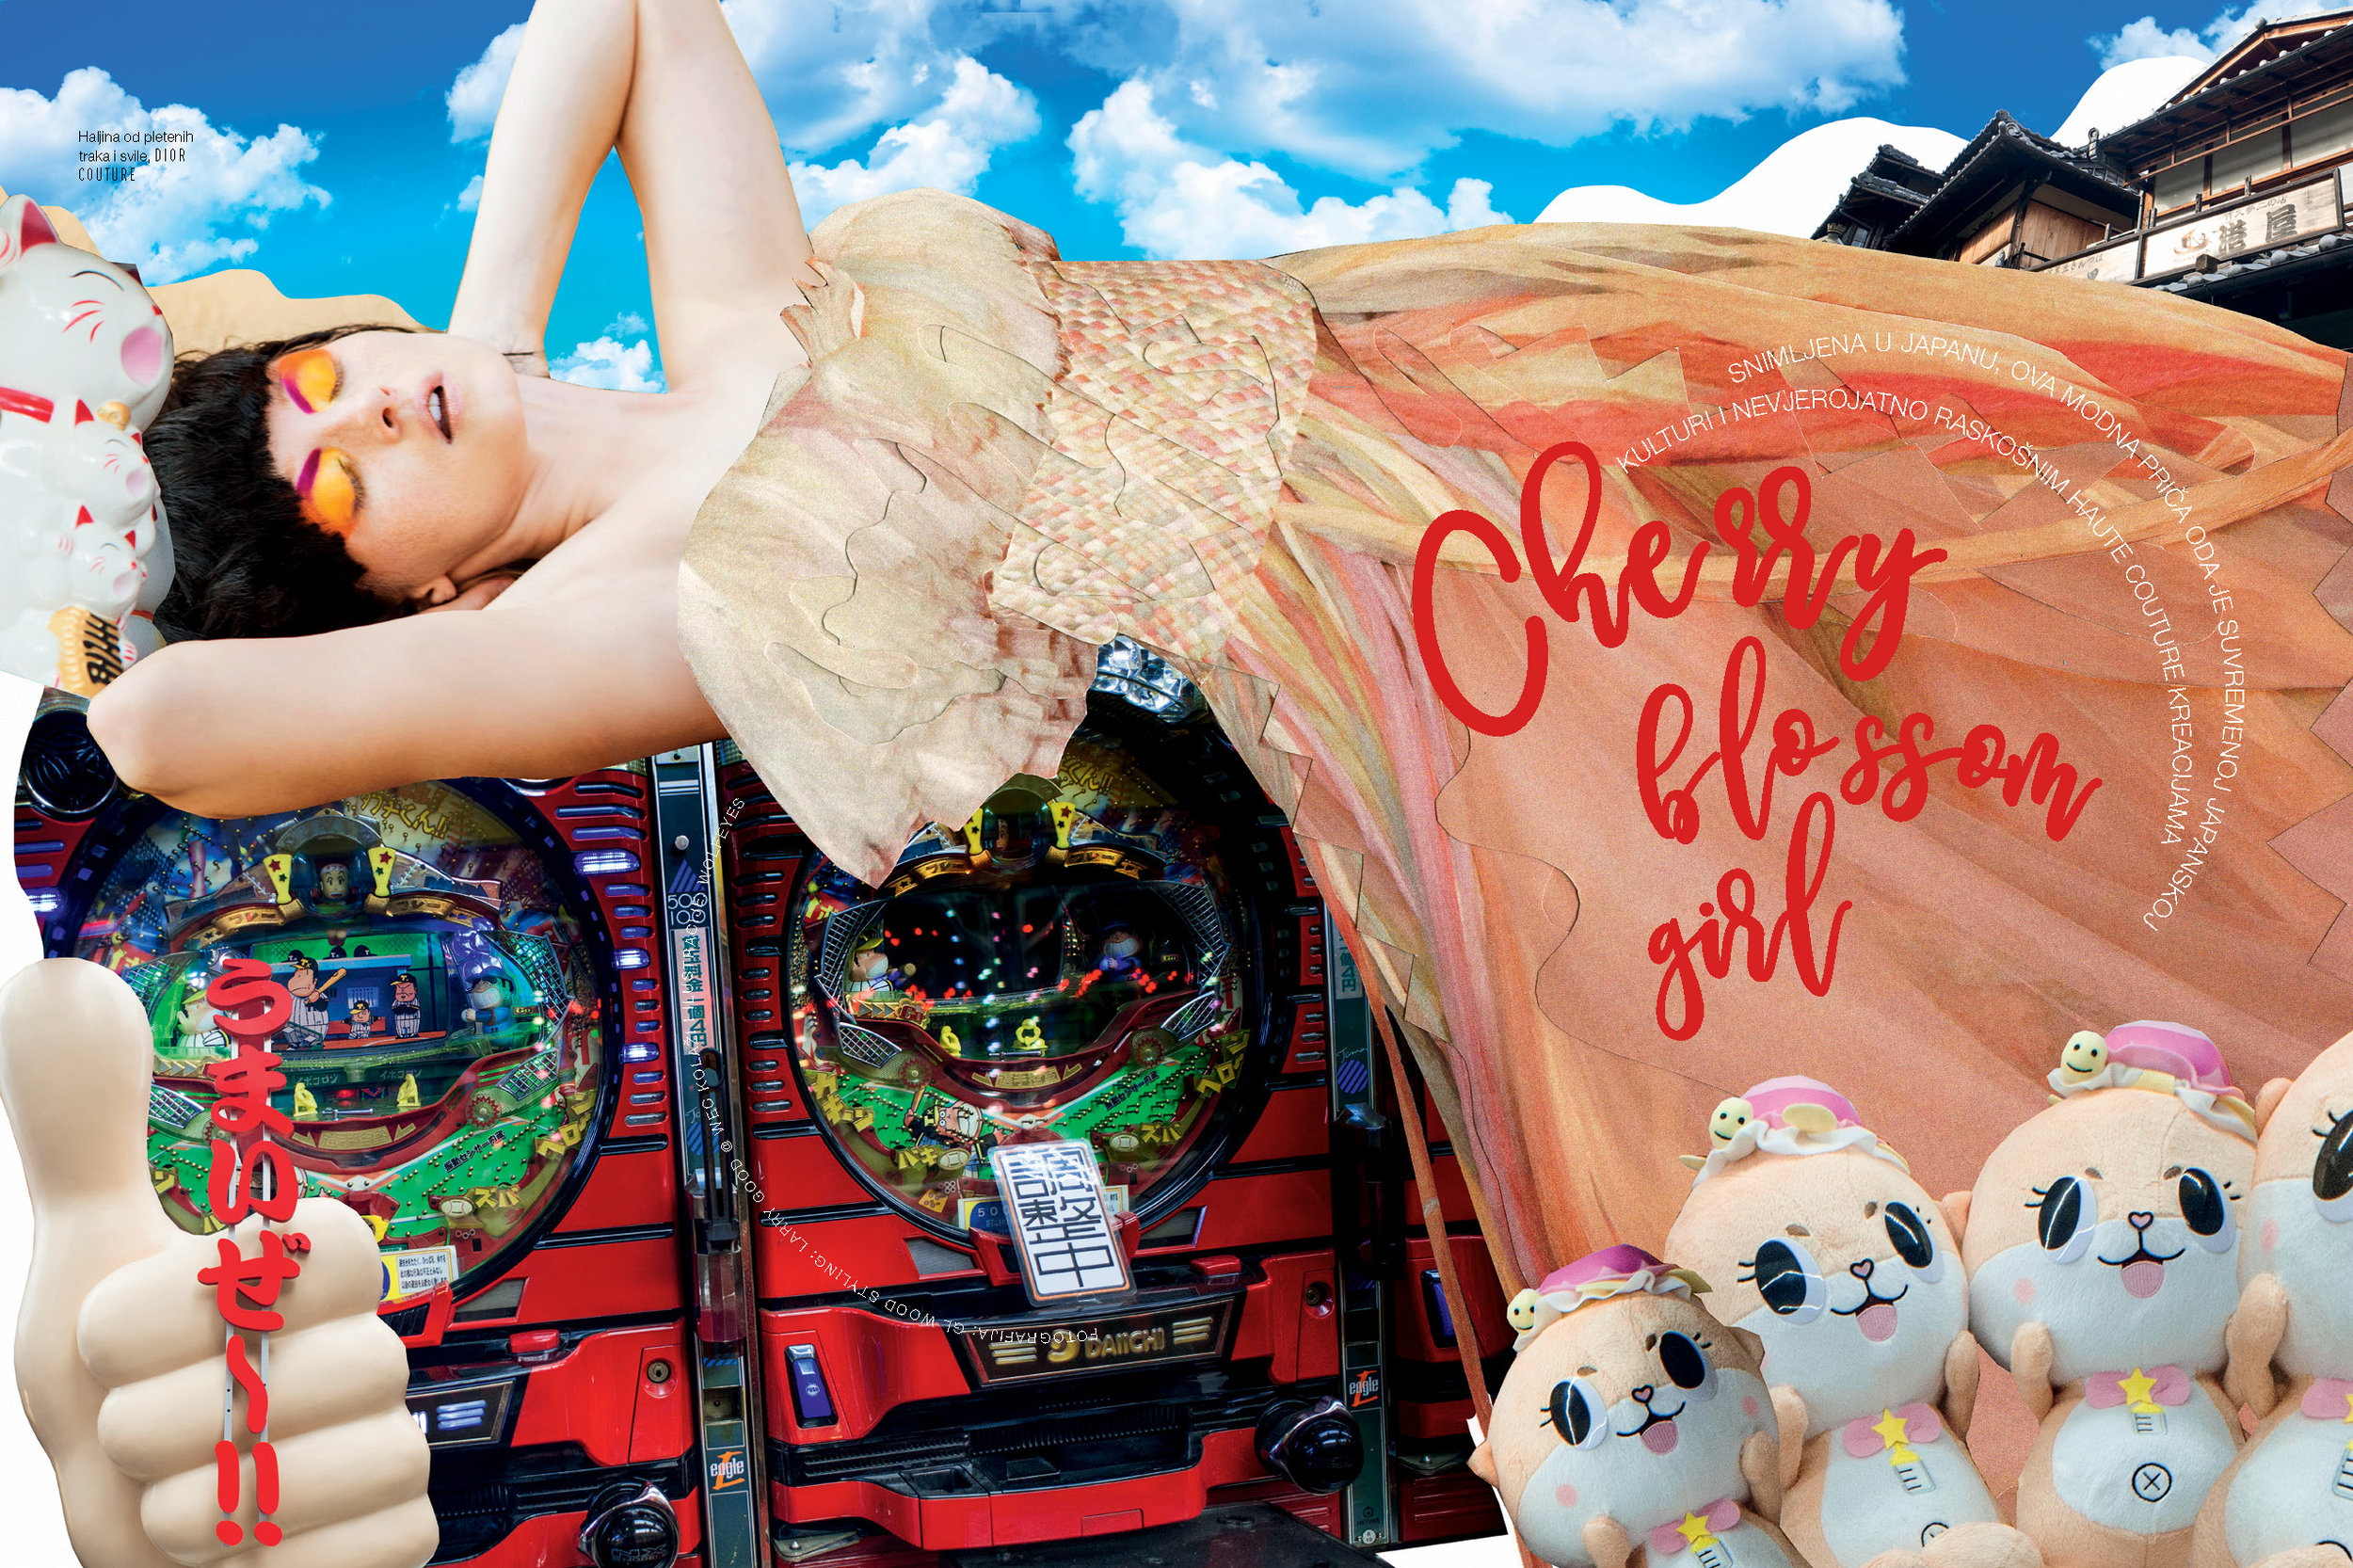 ELLE Croatia GL CherryBlossomGirl_Page_1.jpg